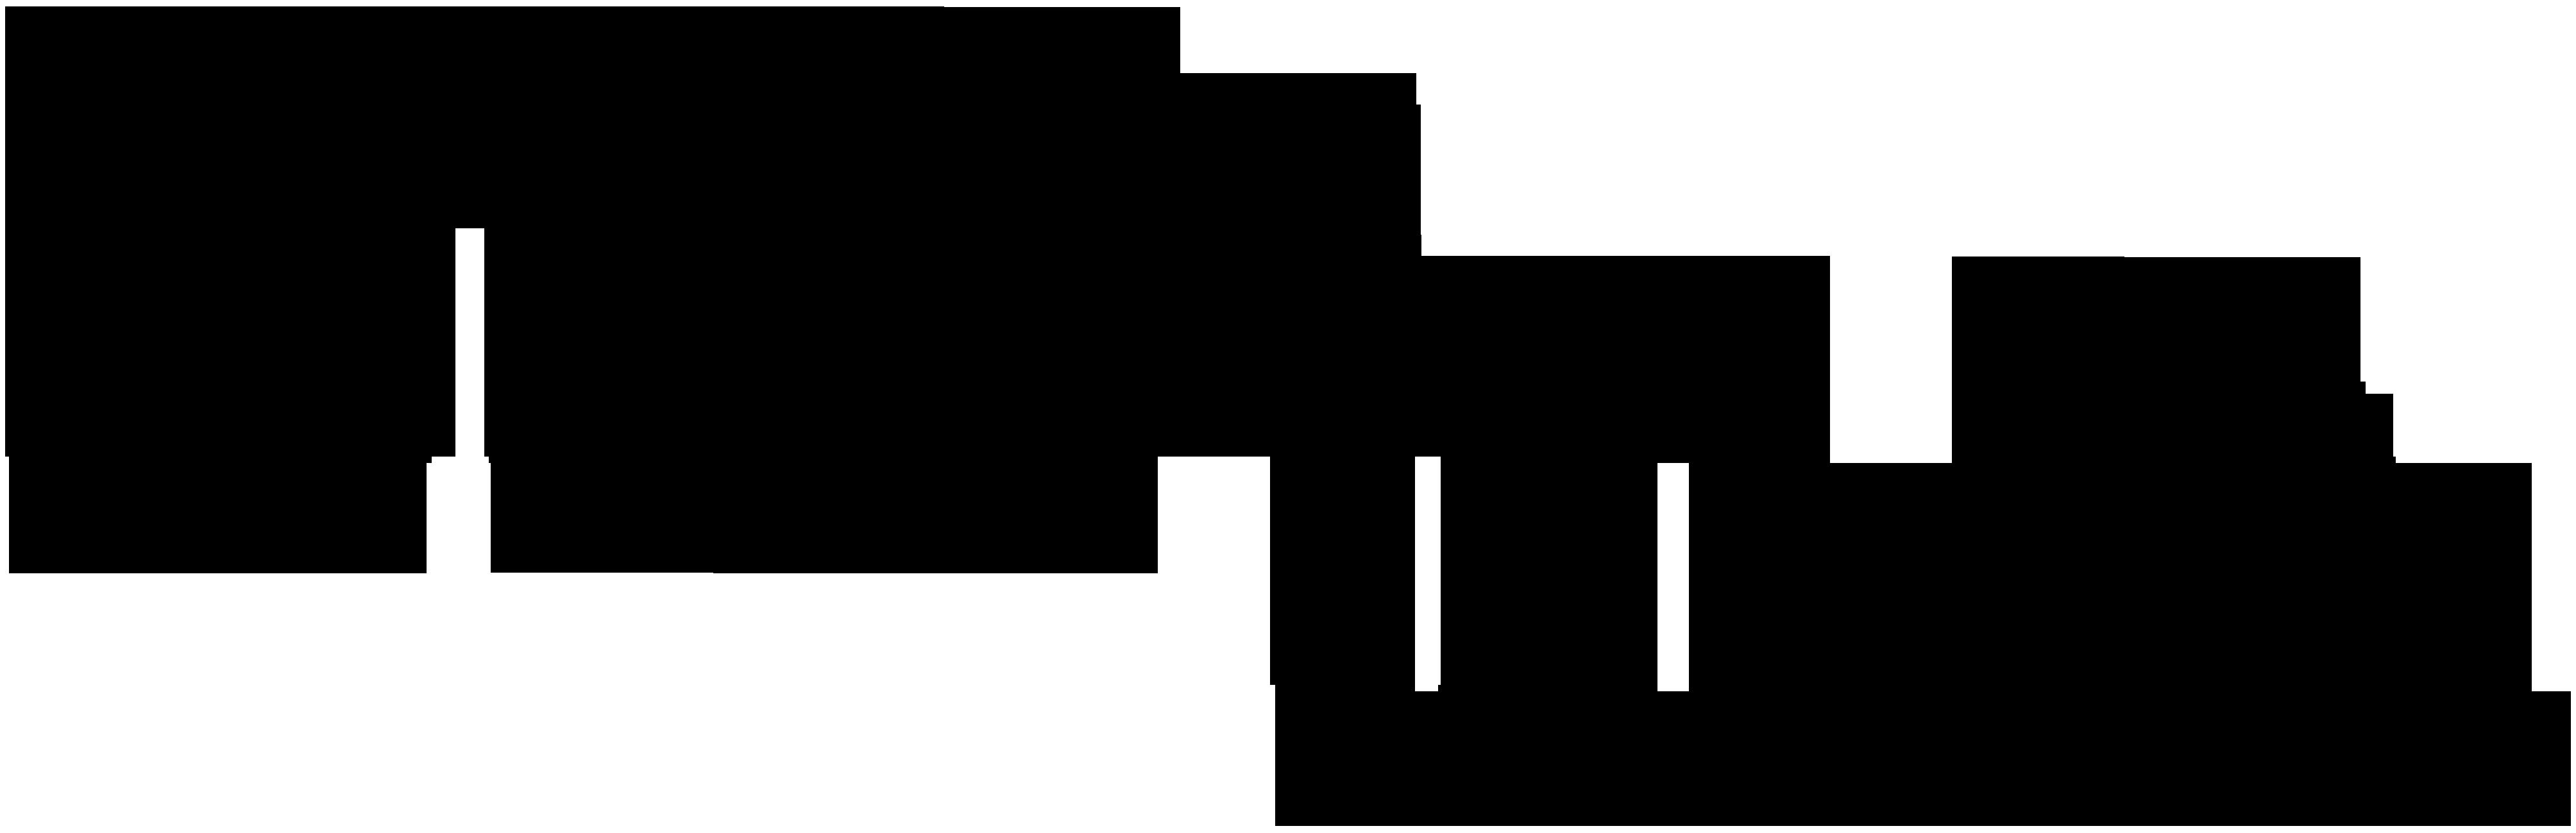 Bottega di Architettura | Carlo Deregibus Silvia Sgarbossa | logo